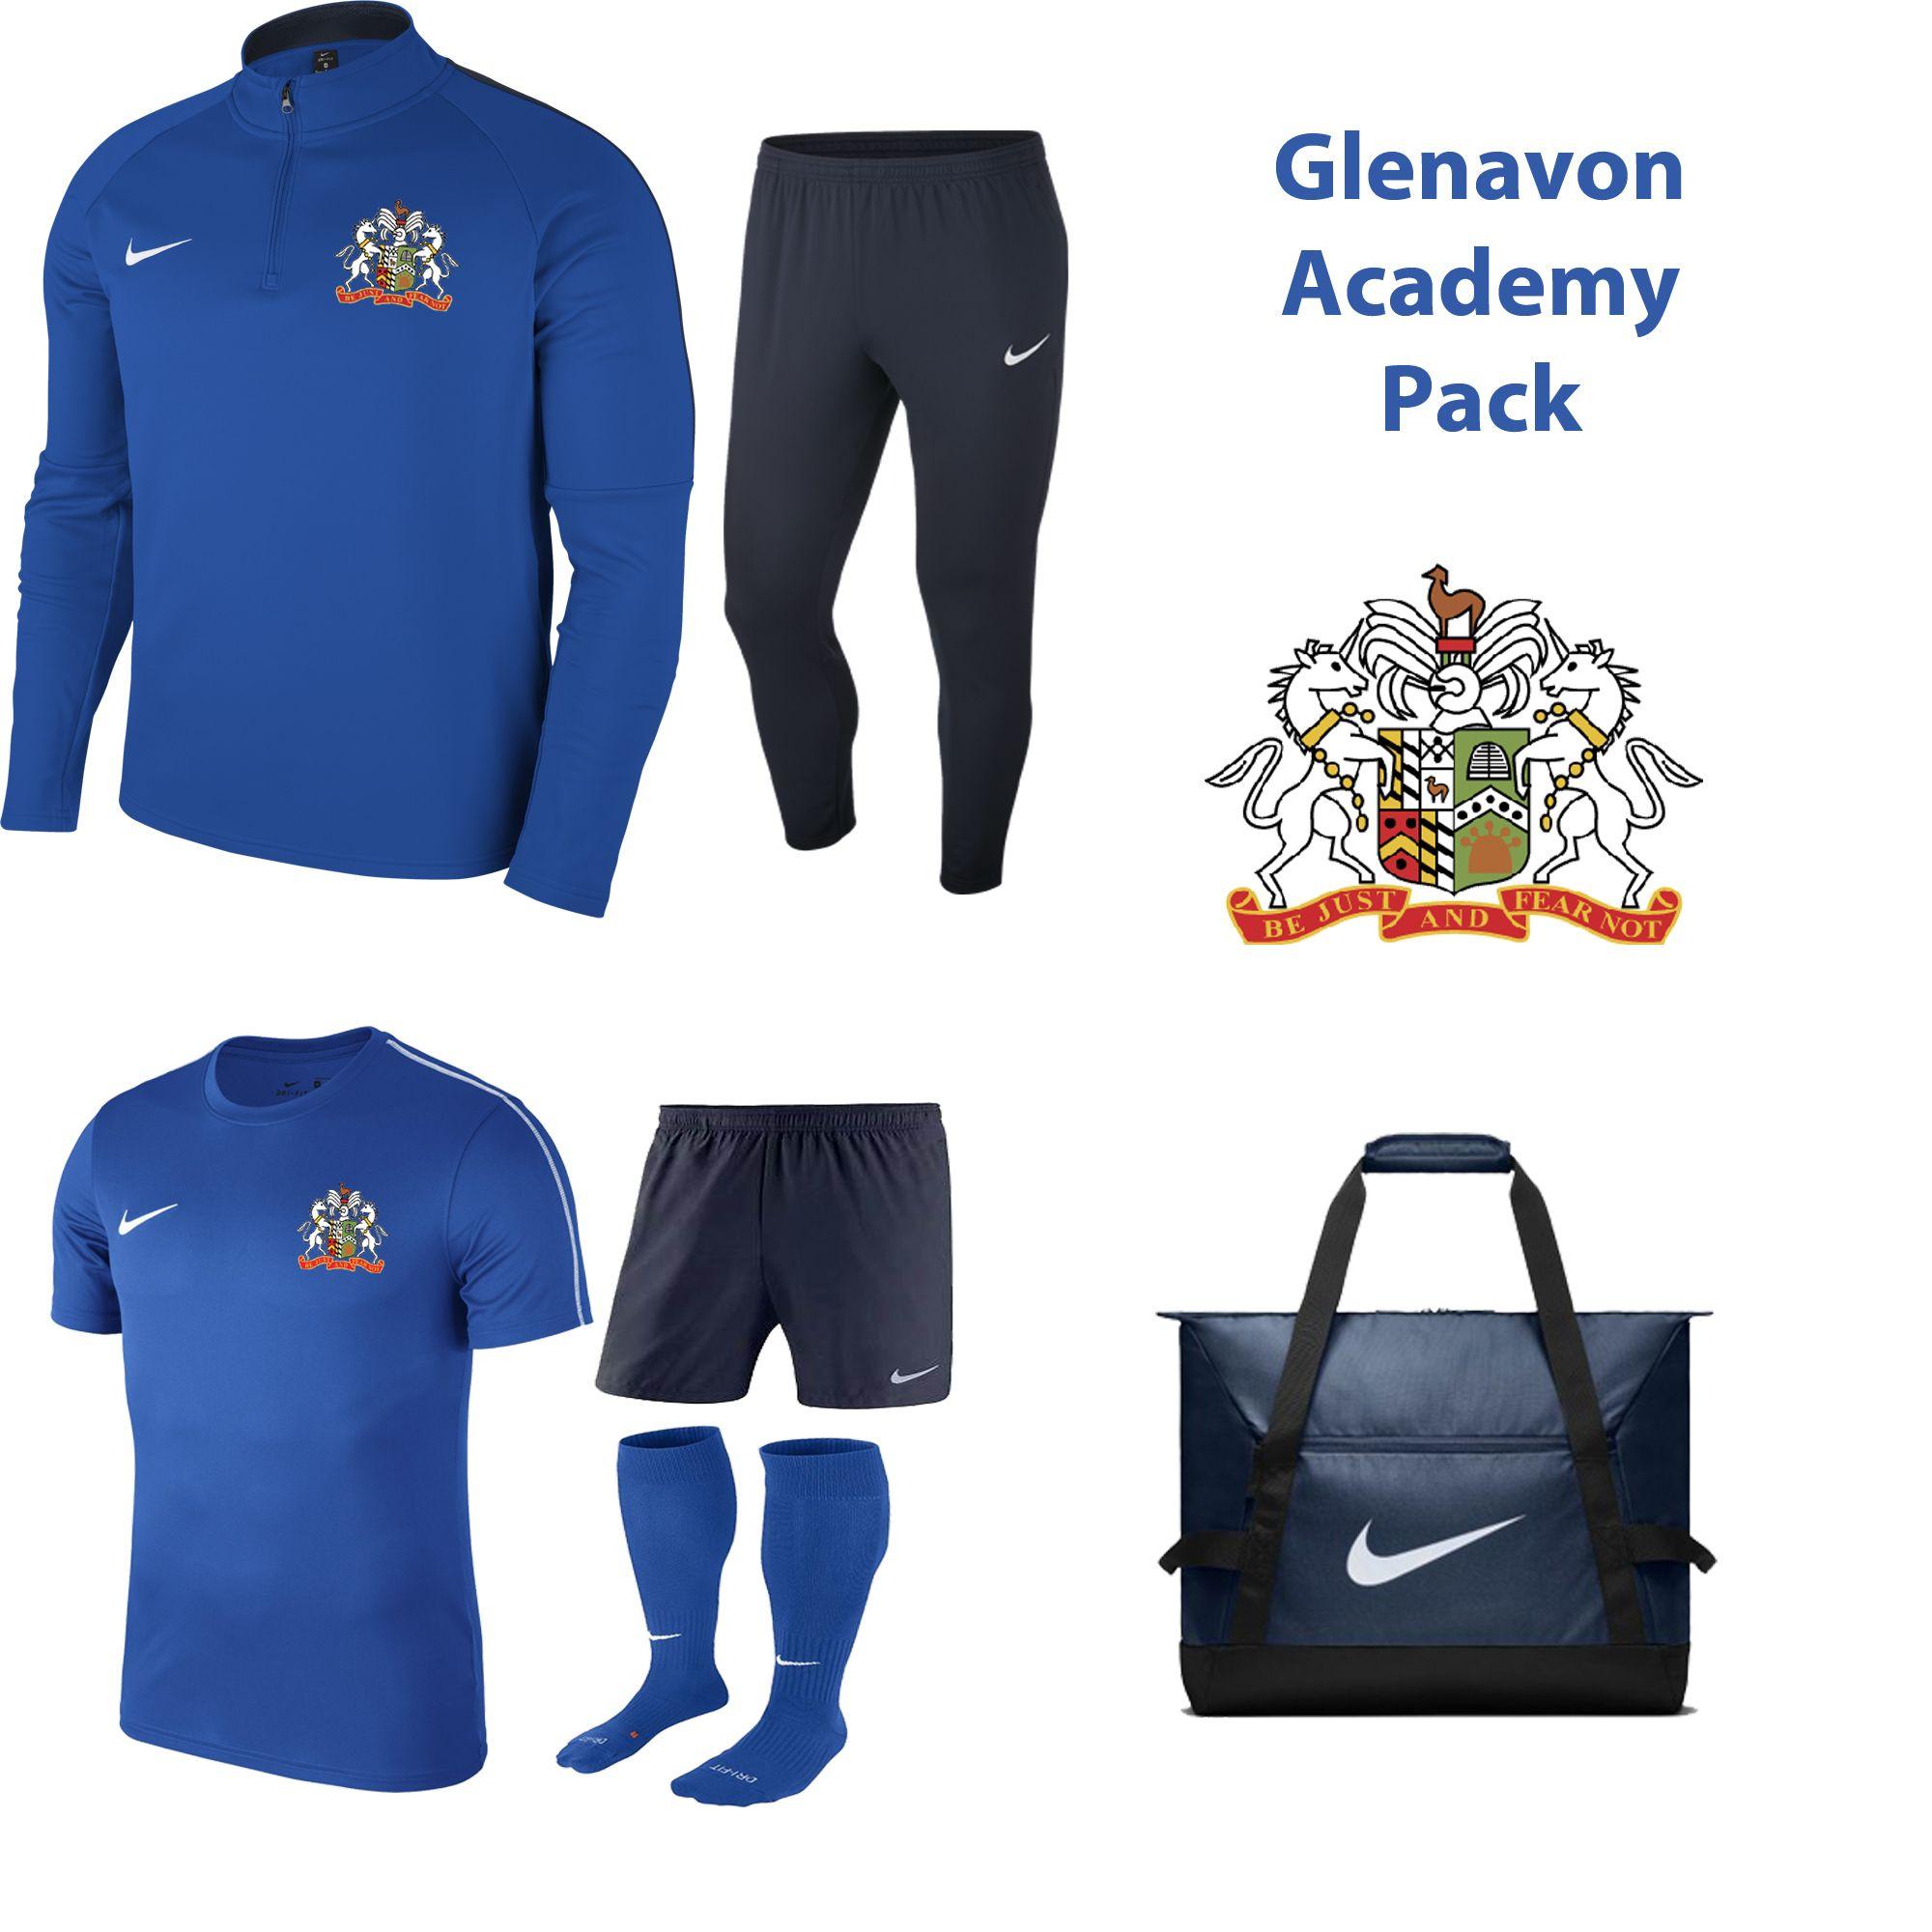 glenavon fc academy pack 21689 p